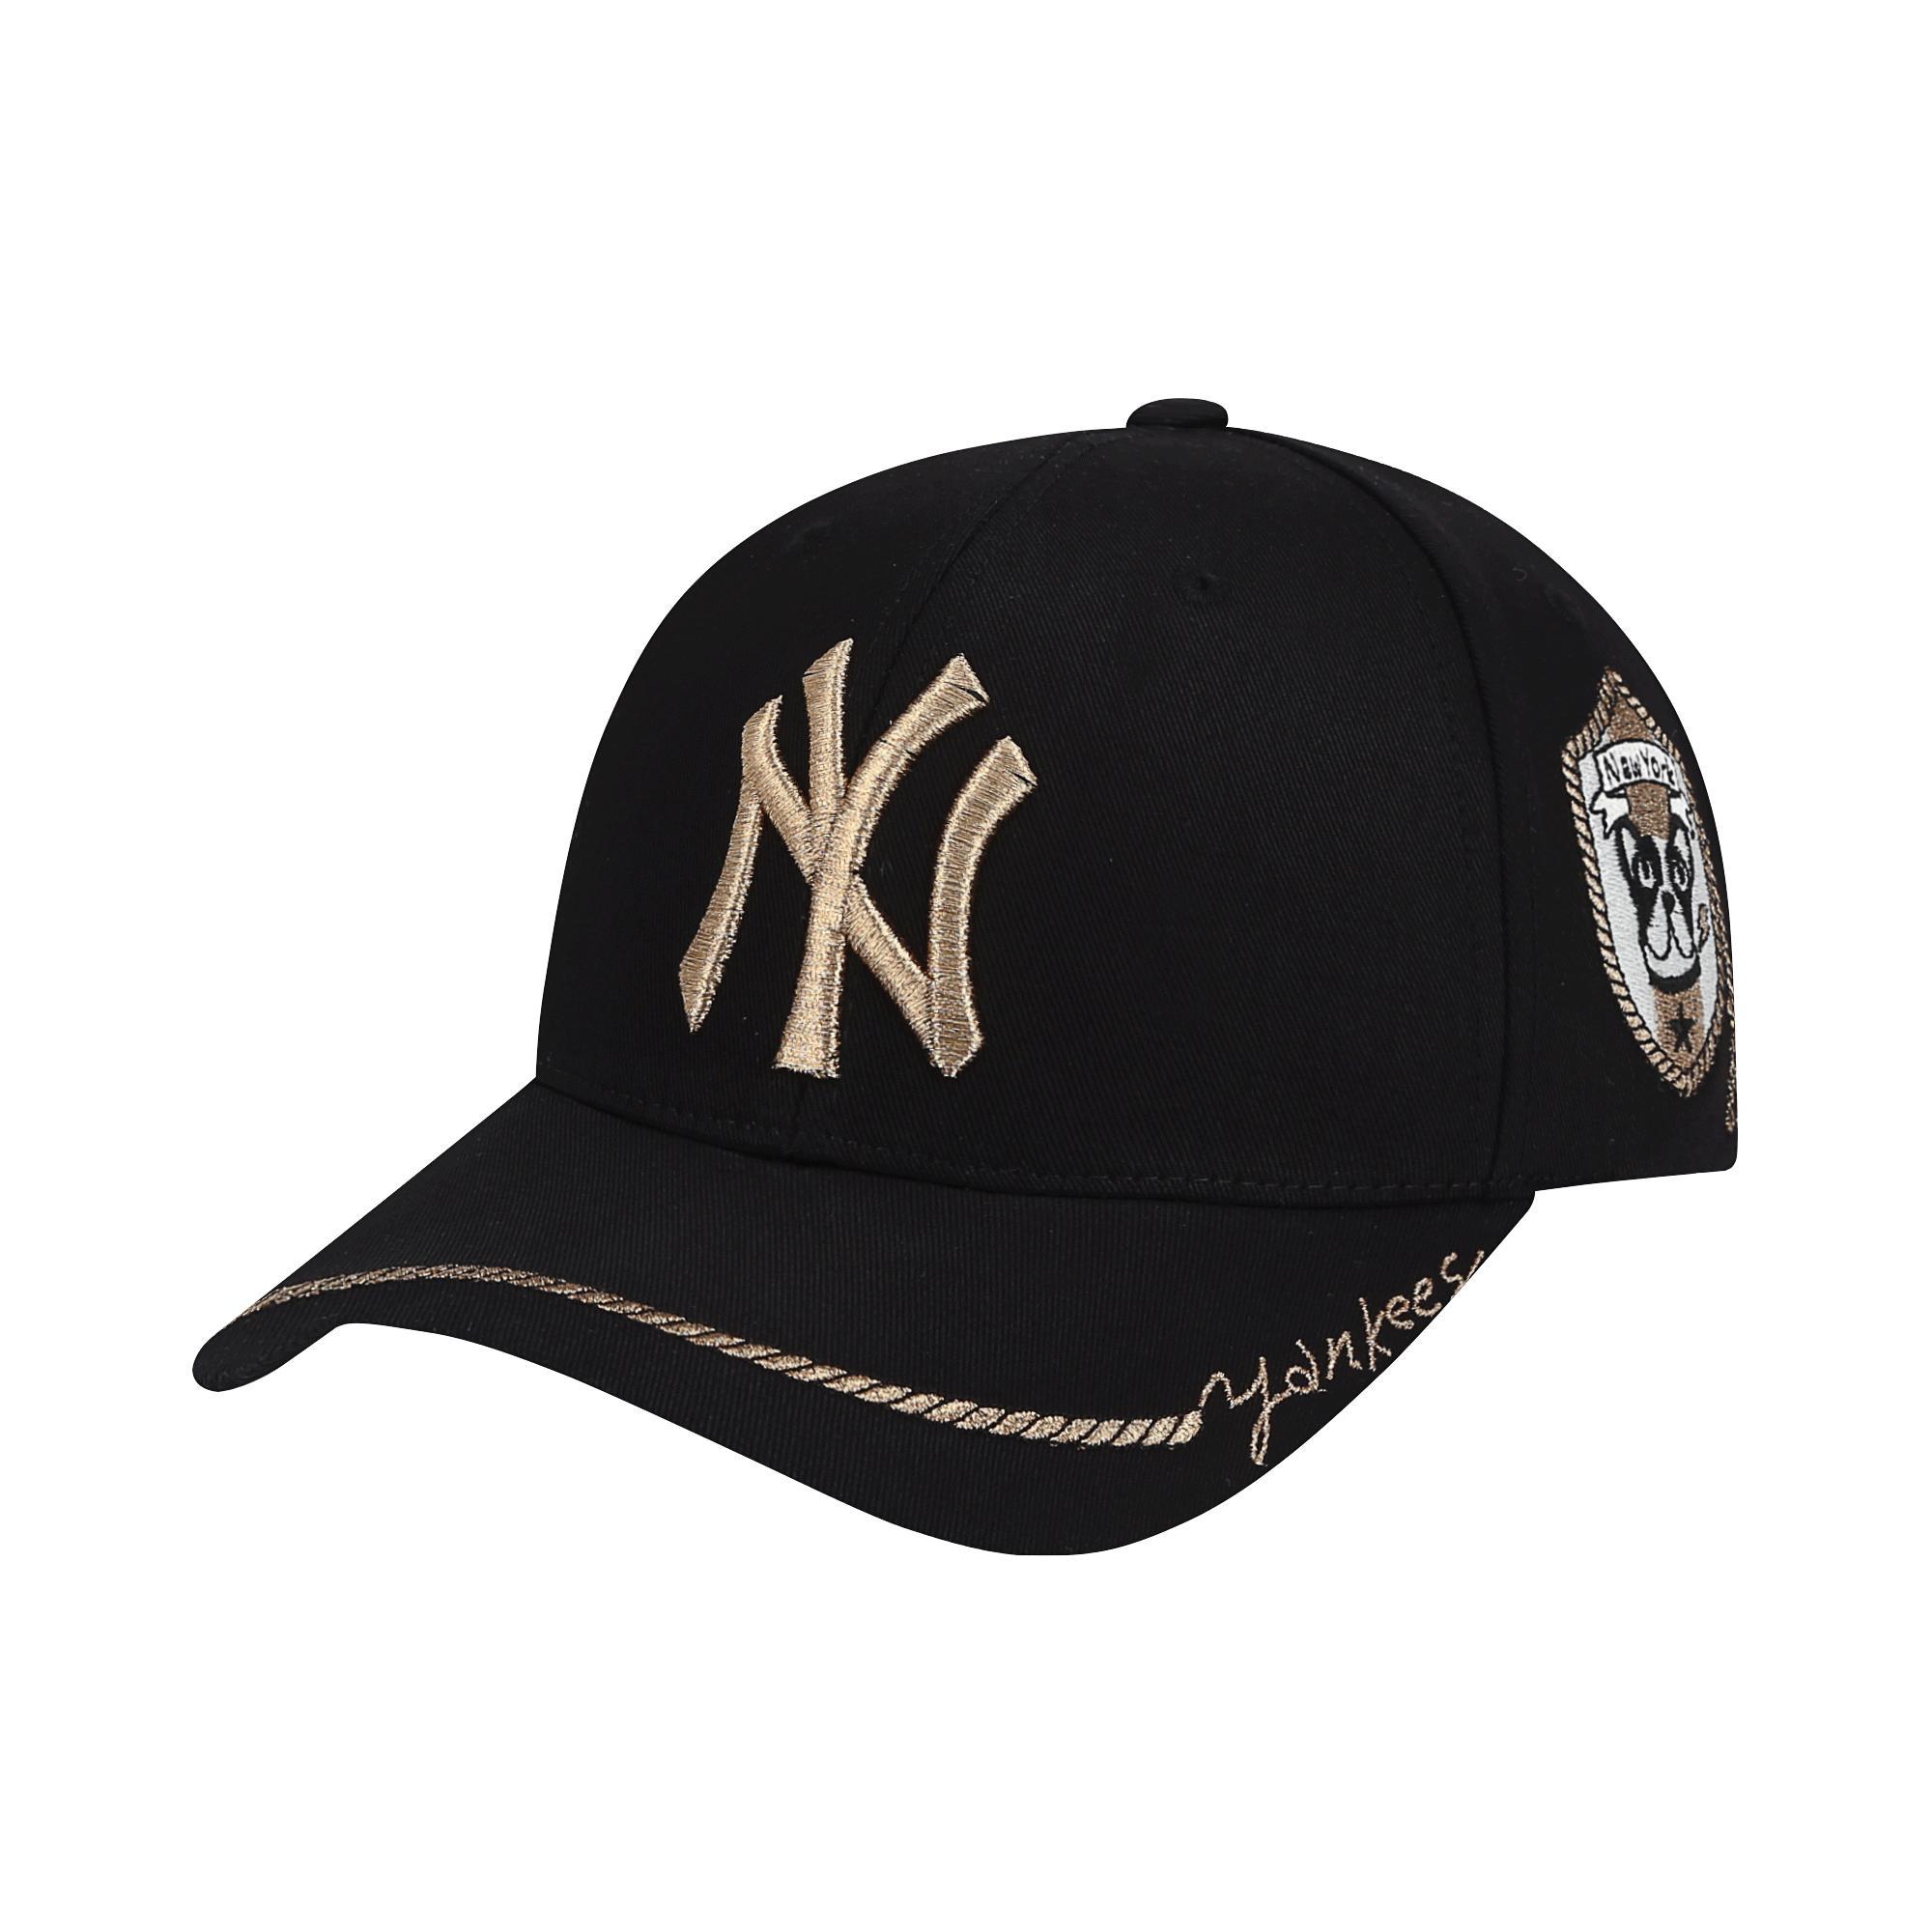 NEW YORK YANKEES BARK SHIELD ADJUSTABLE CAP